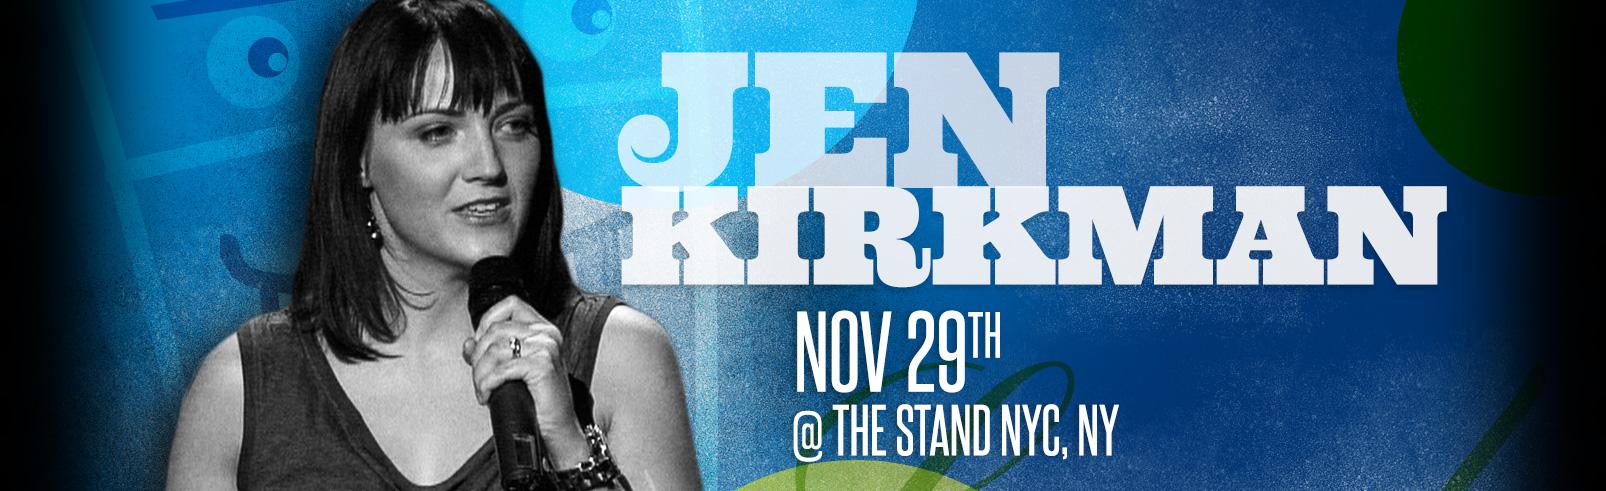 Jen Kirkman @ The Stand NYC